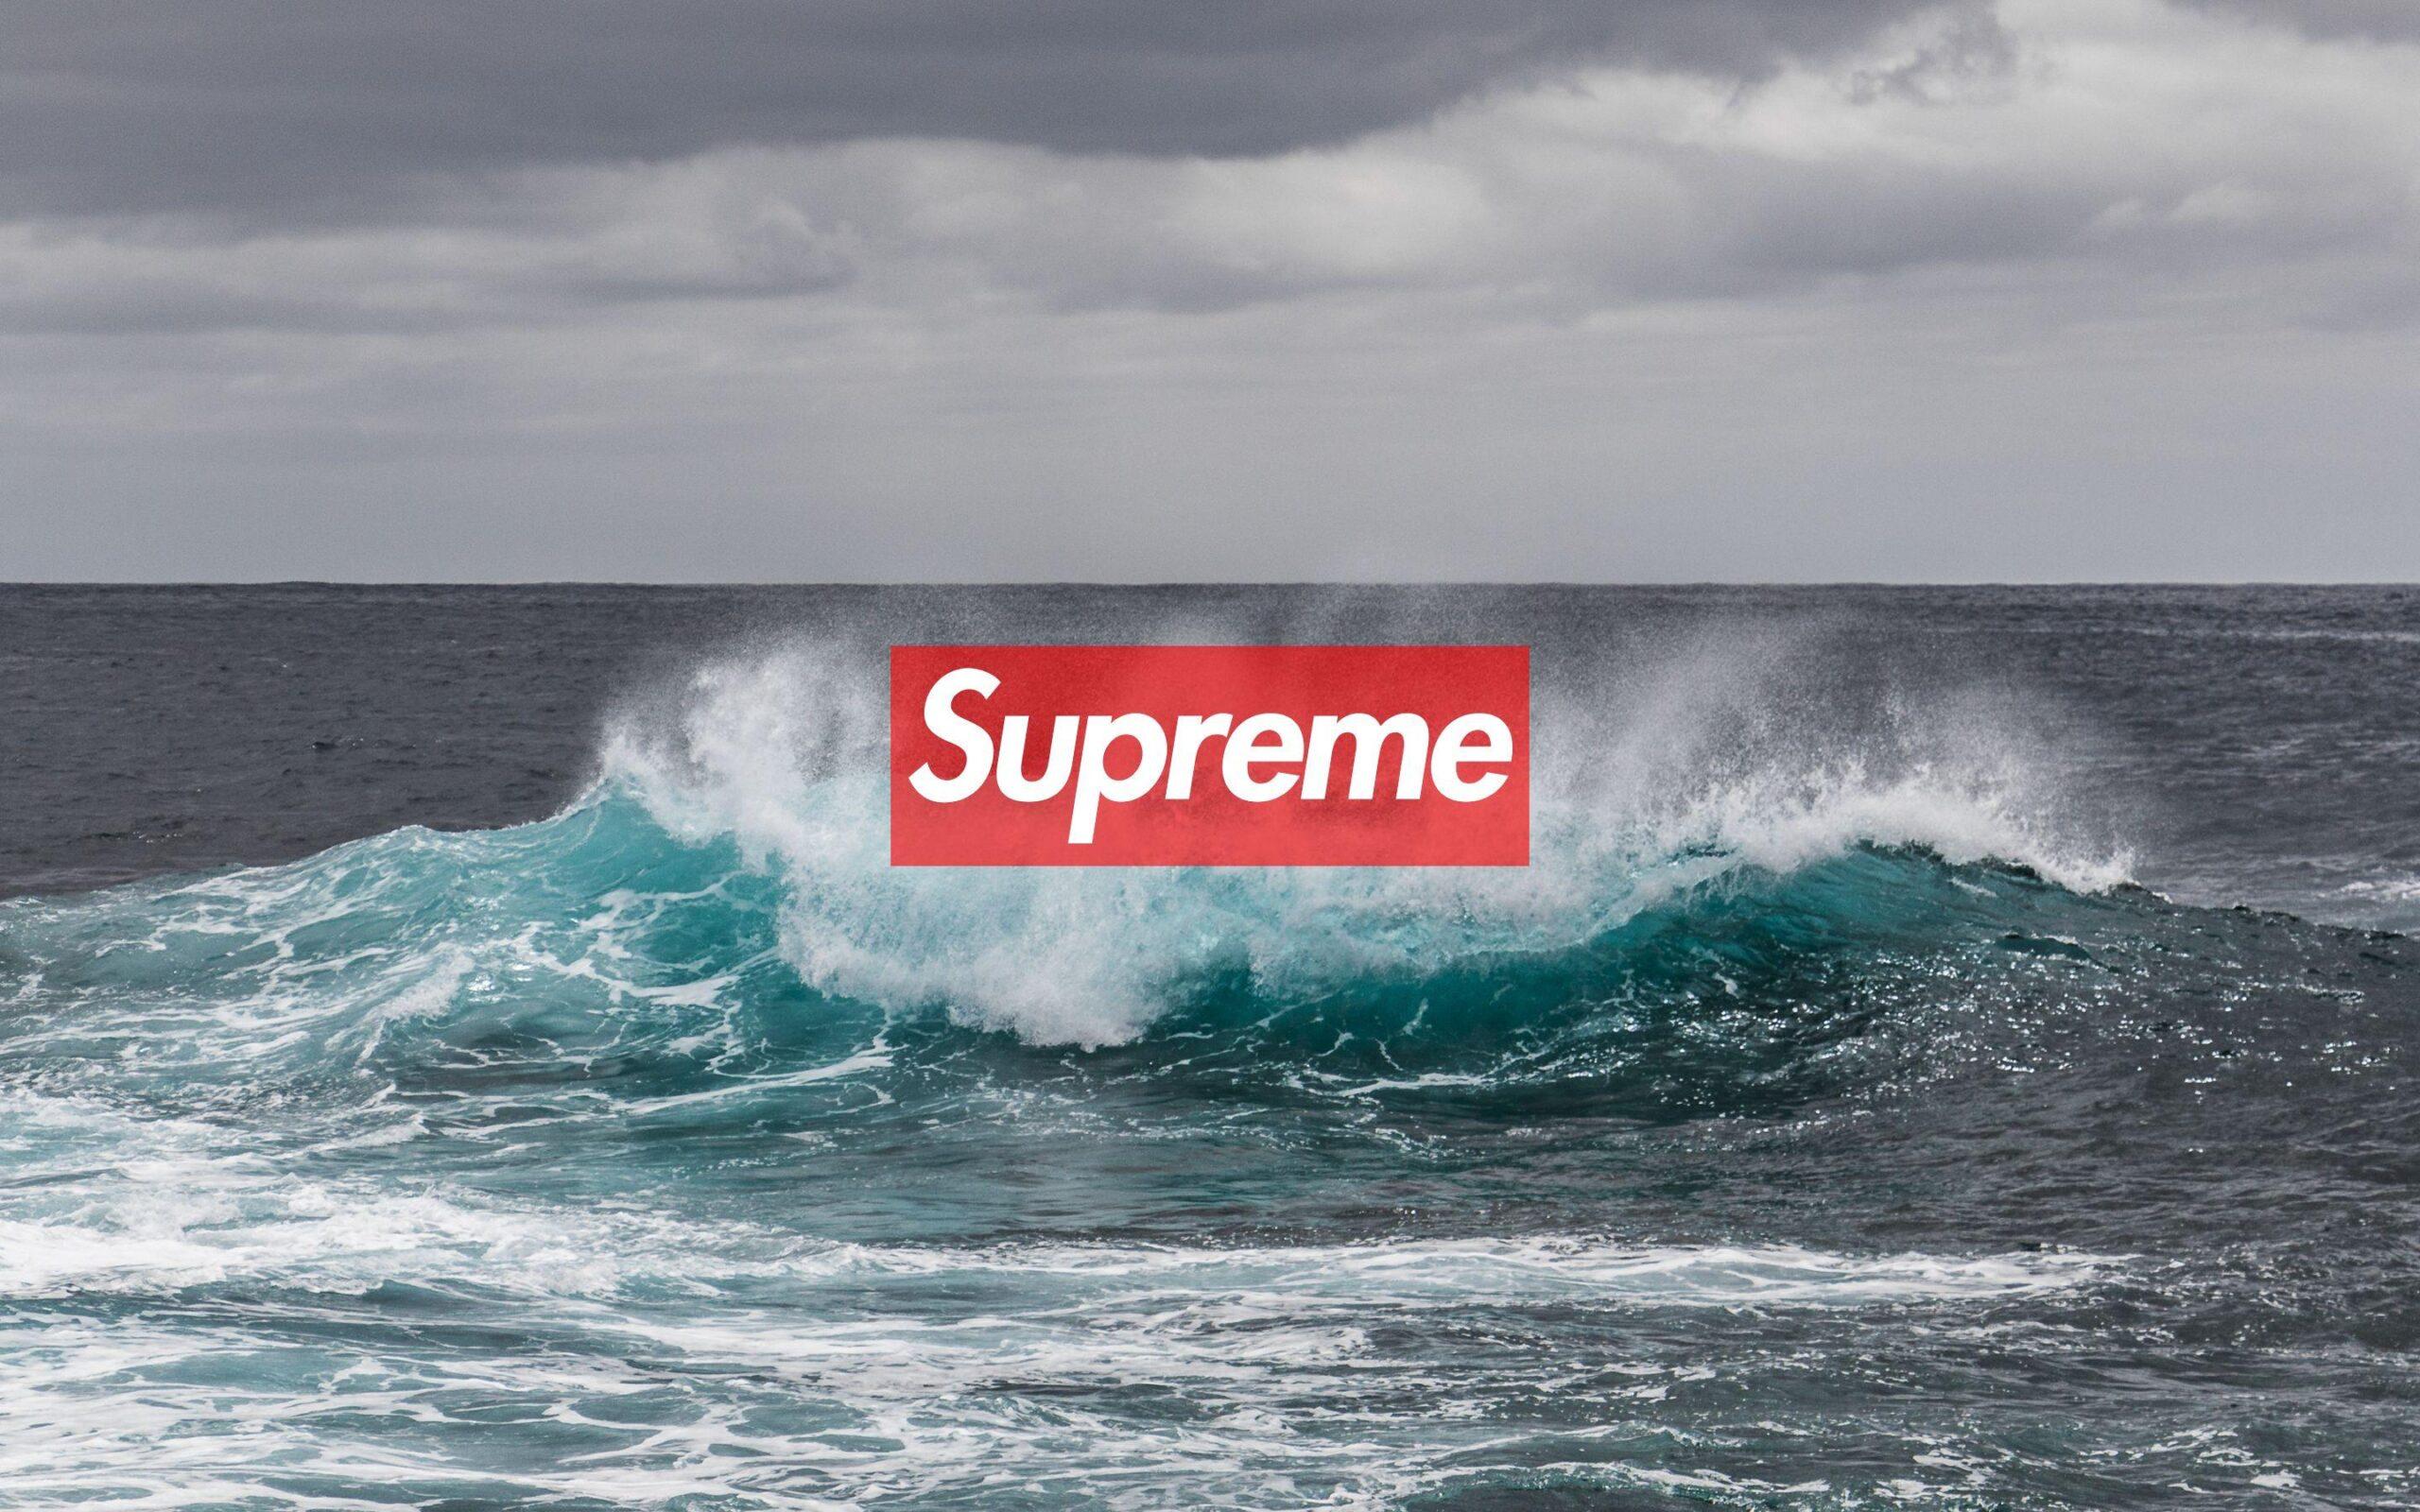 supreme background wallpaper 73566